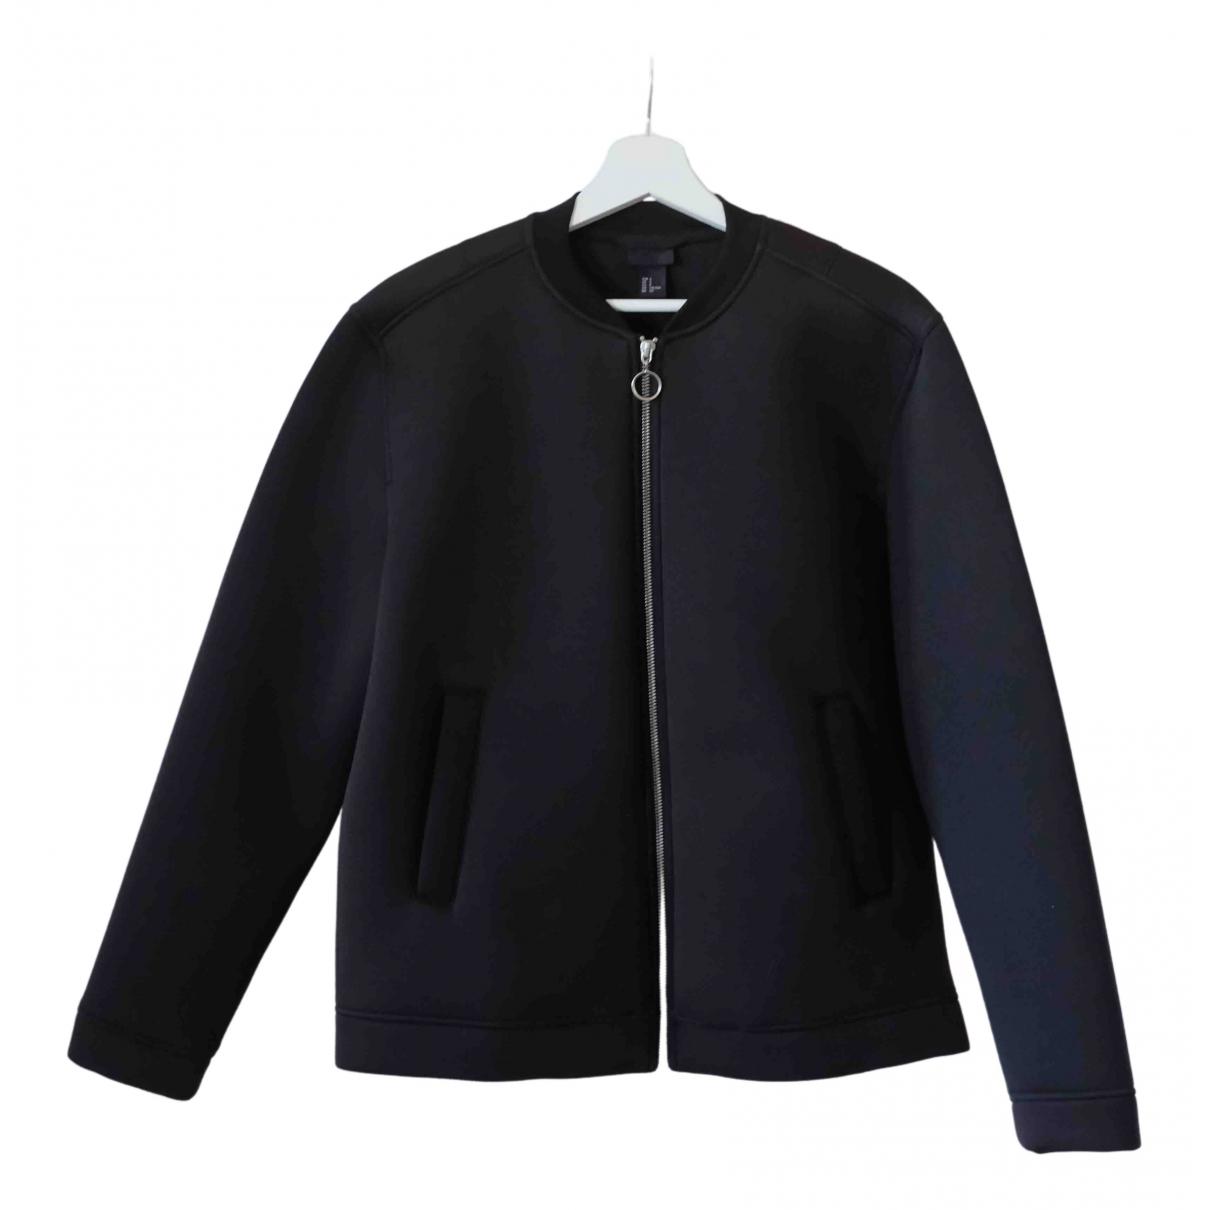 H&m Studio \N Black jacket  for Men S International